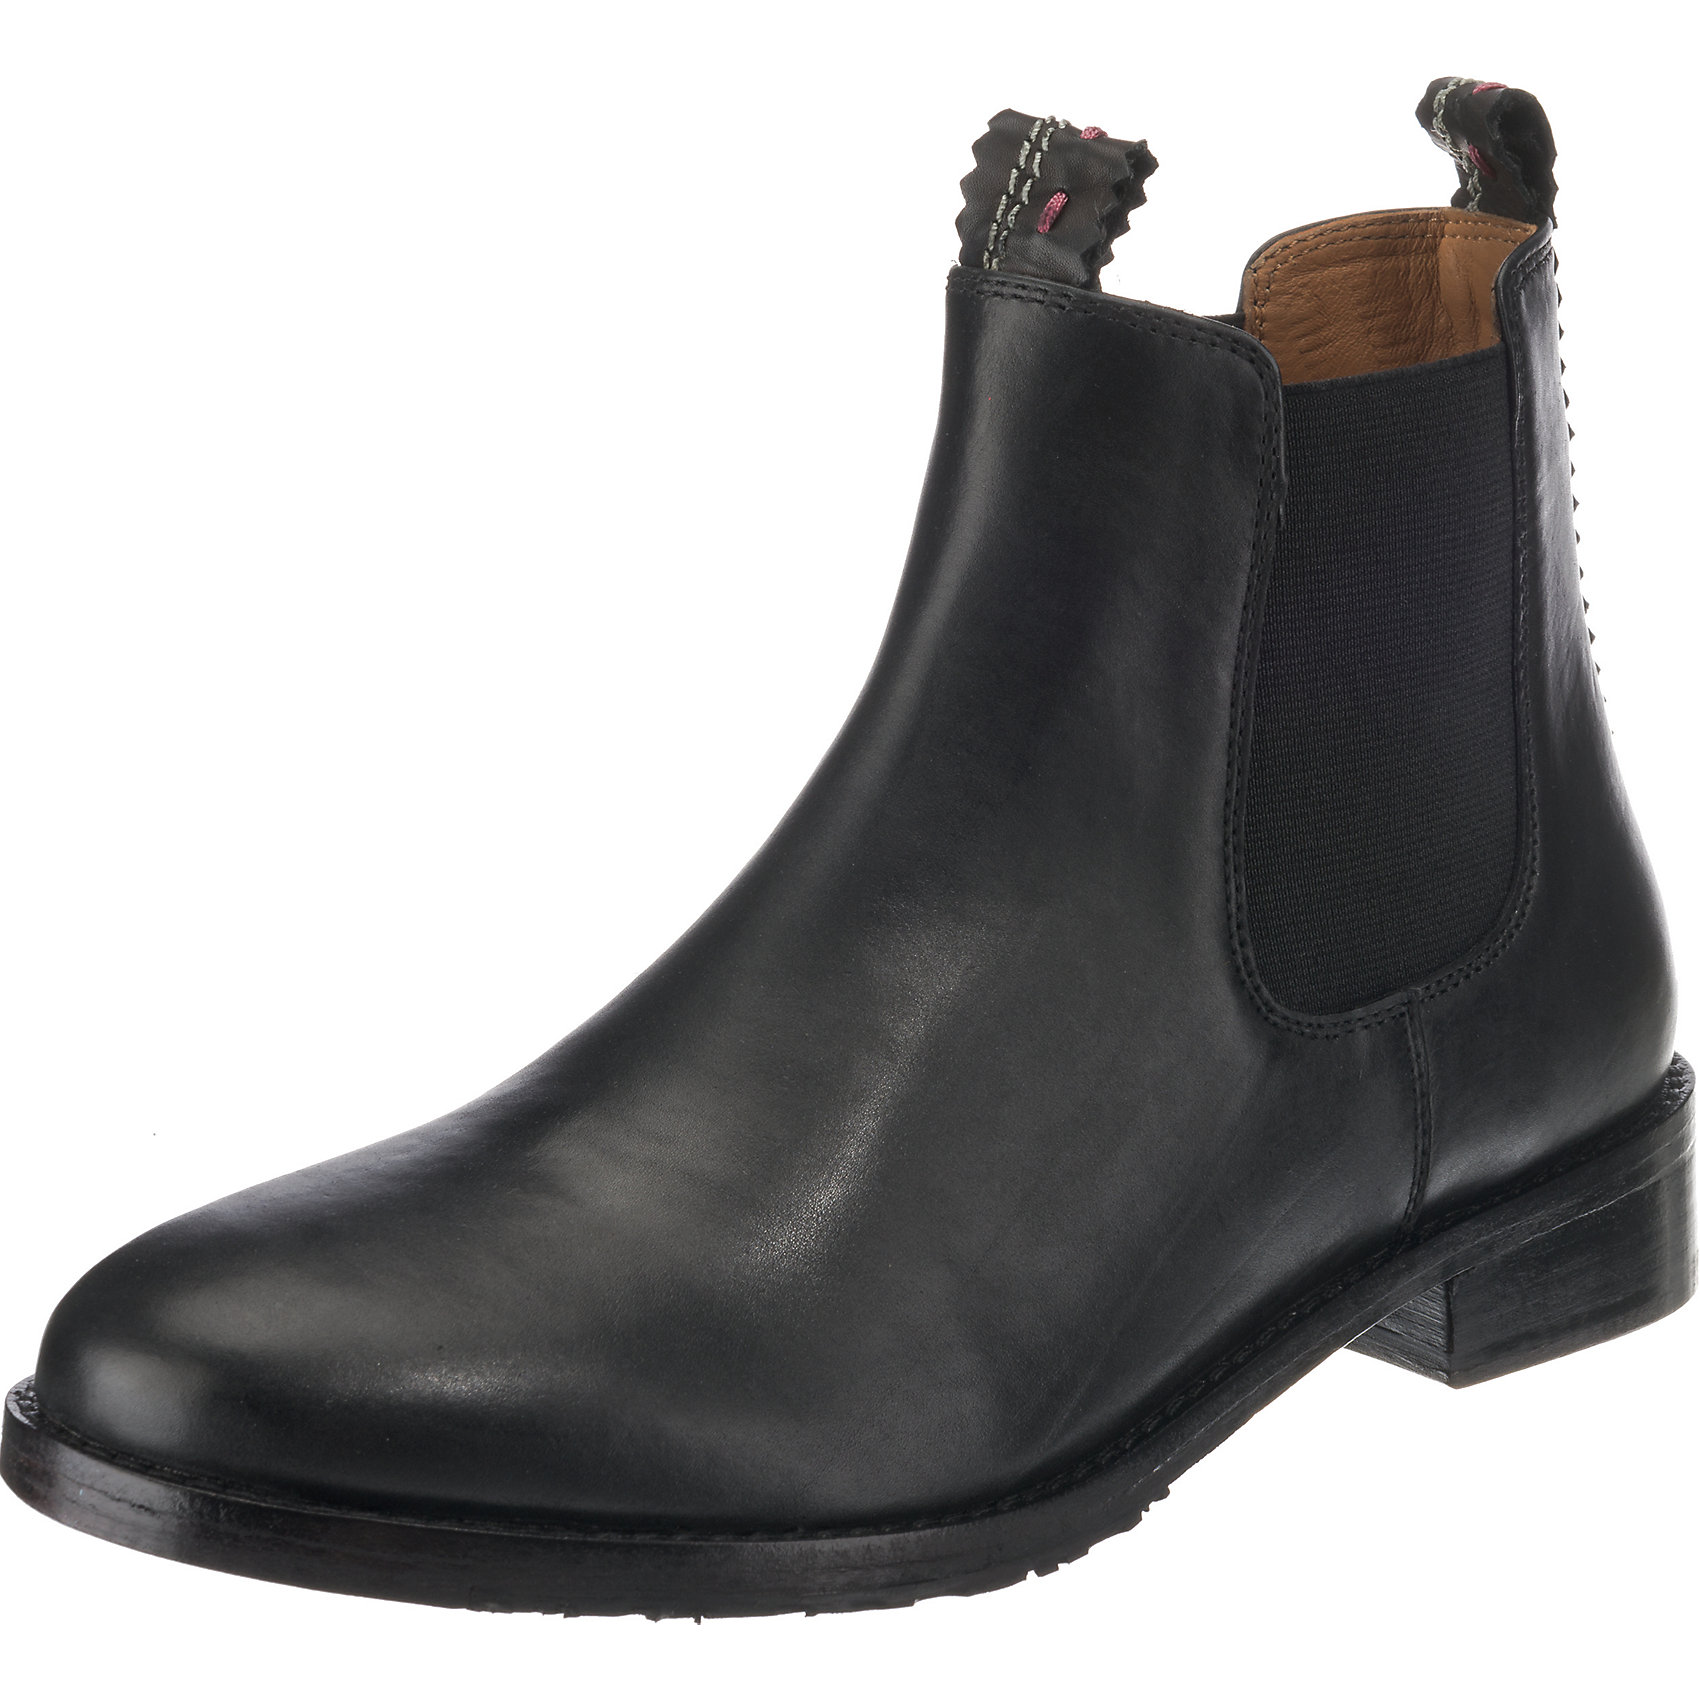 Neu CRICKIT Torrente bolivia Chelsea Chelsea bolivia Stiefel 8397875 für Damen schwarz bd7db1